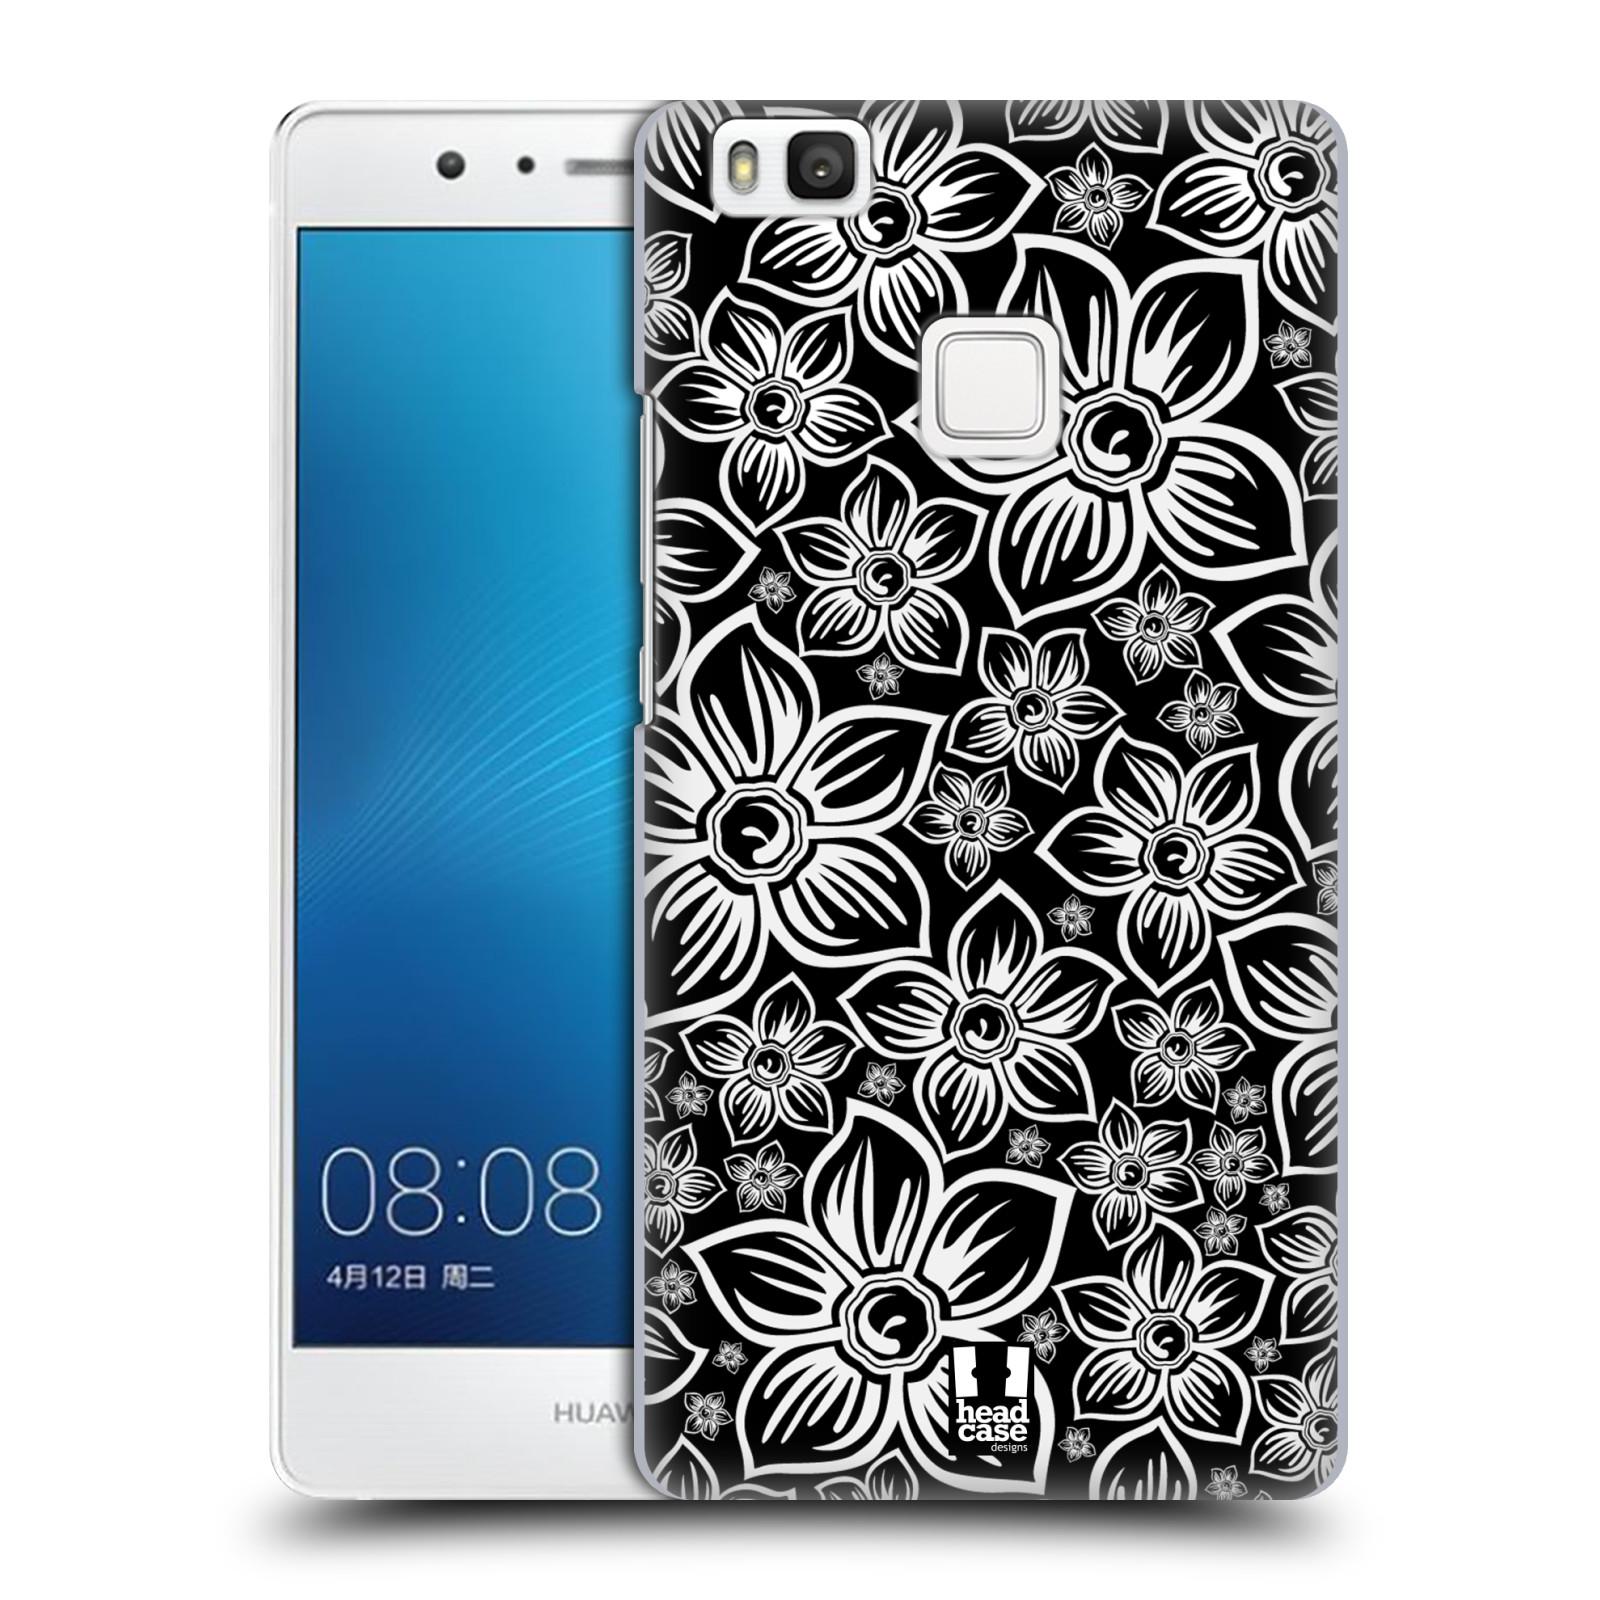 Plastové pouzdro na mobil Huawei P9 Lite HEAD CASE FLORAL DAISY